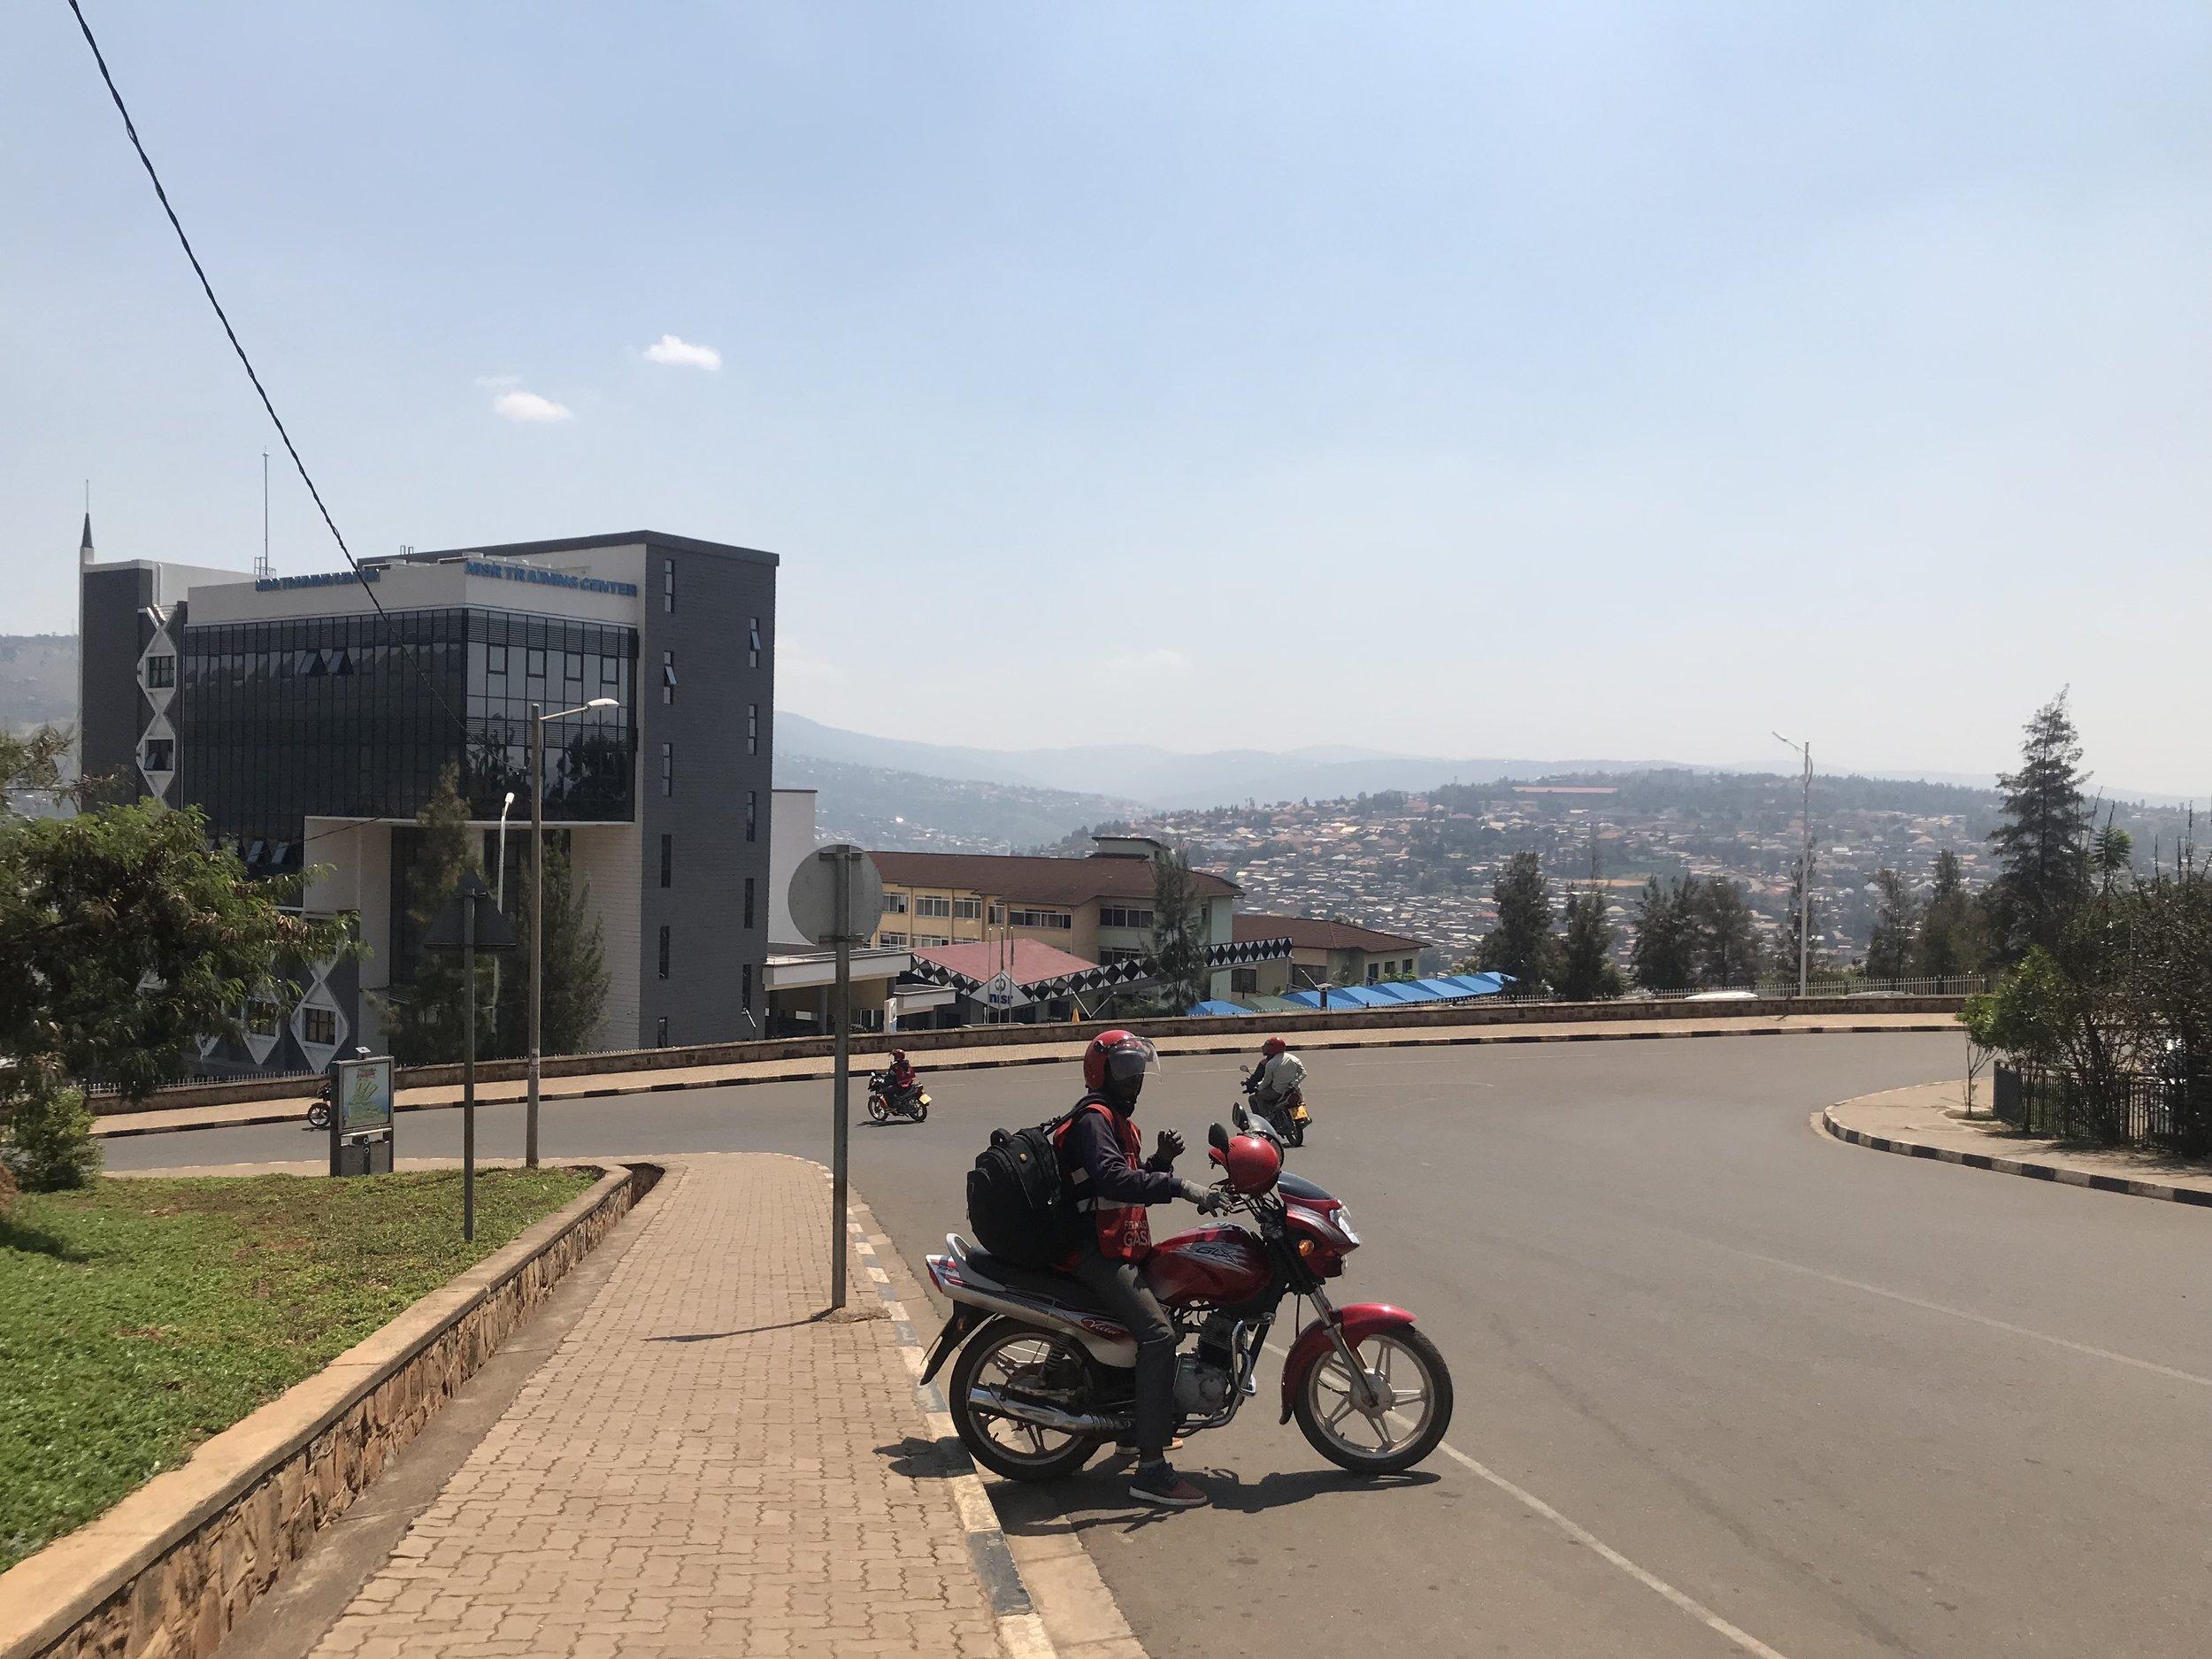 IMG_5628 2VickieRemoe-travel-kigali-rwanda-review-kwibohora25-hotels-africa.JPG